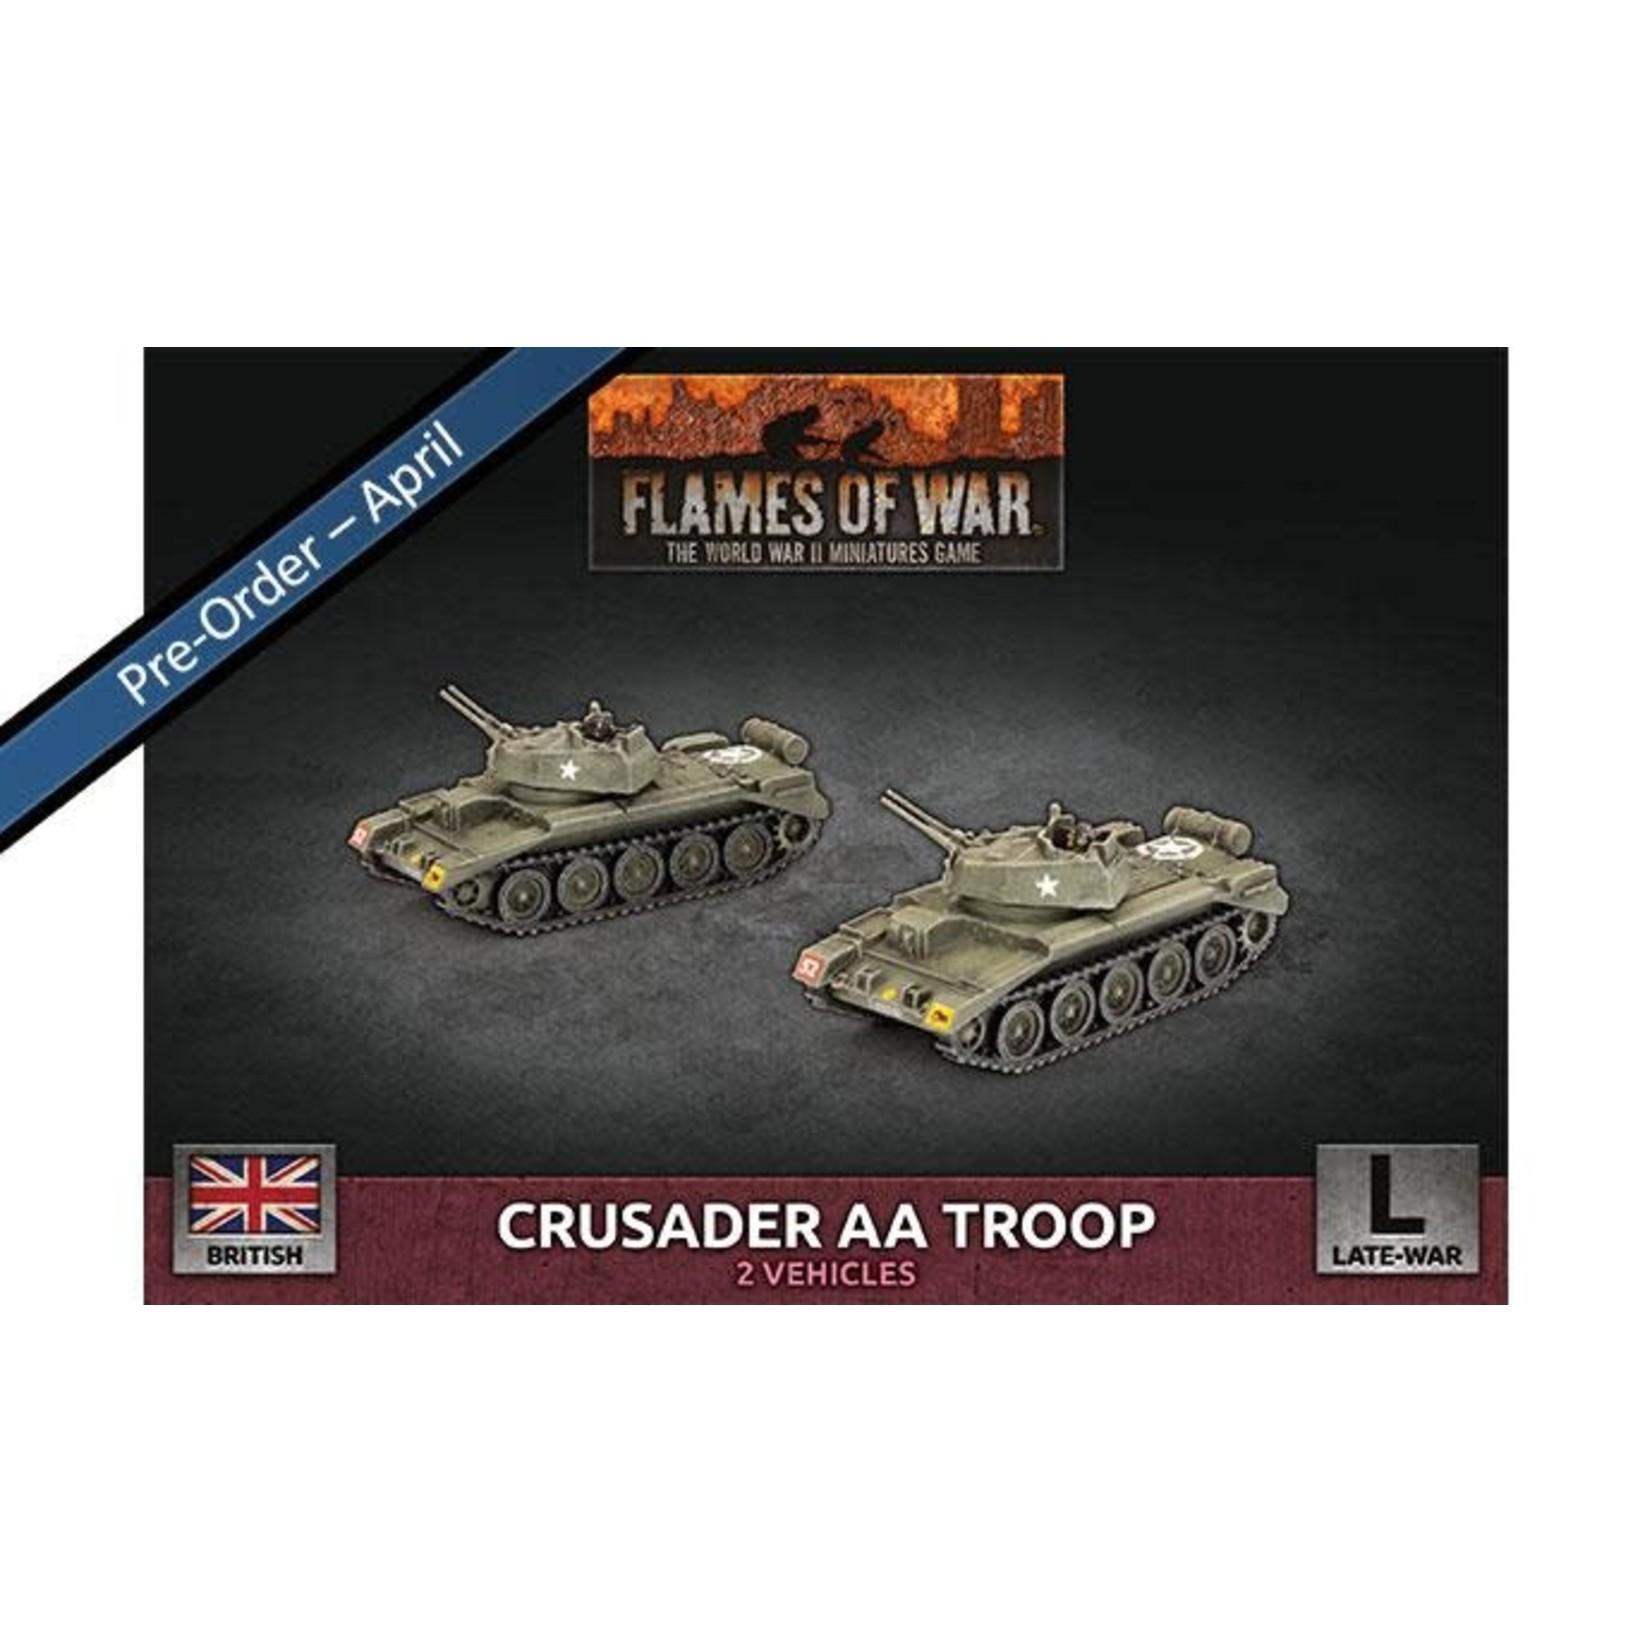 Battlefront Miniatures Ltd Crusader AA Troop